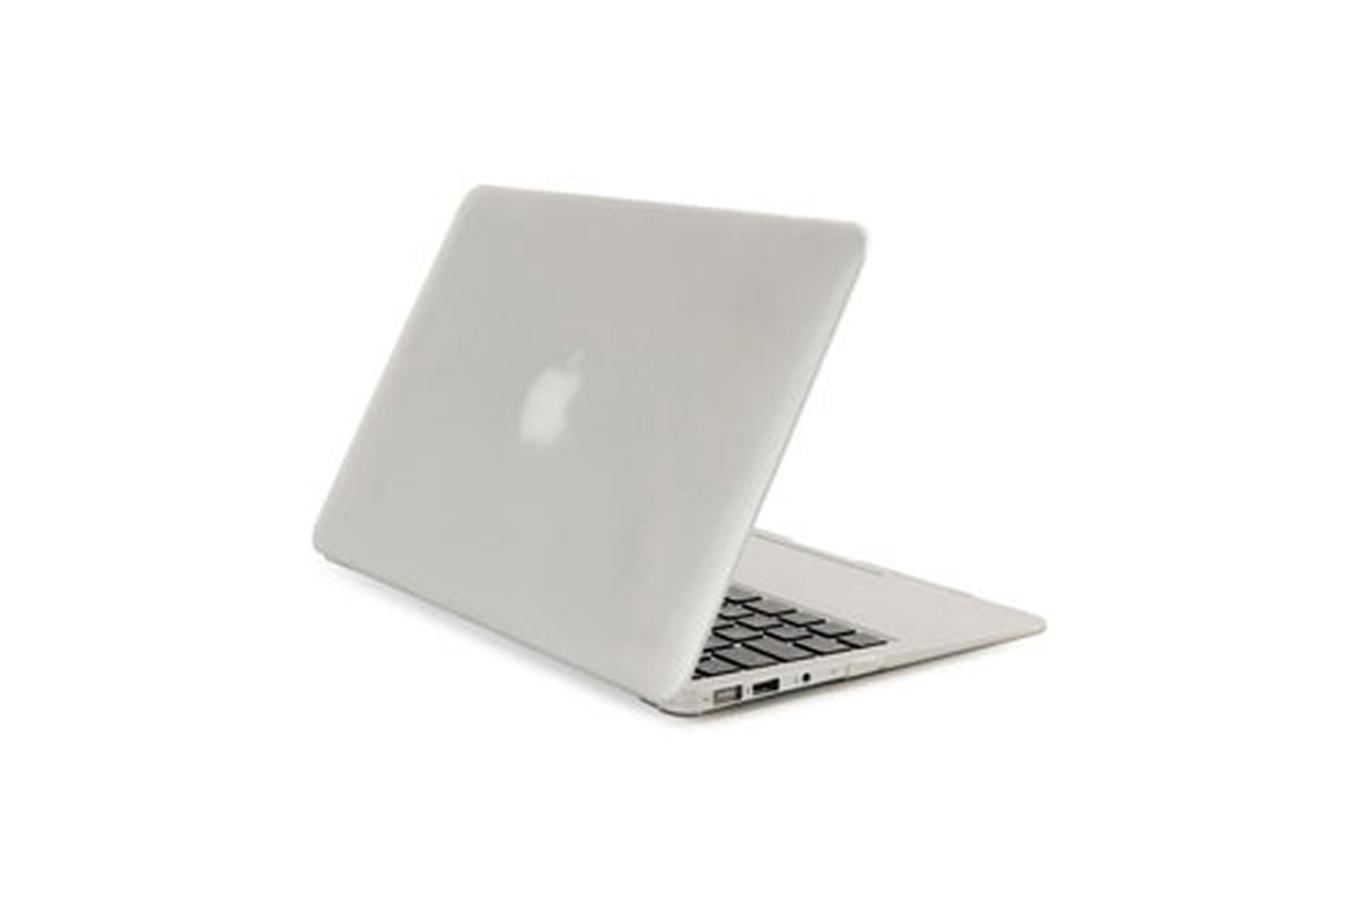 sacoche pour ordinateur portable tucano coque rigide transparente nido pour macbook pro 13. Black Bedroom Furniture Sets. Home Design Ideas